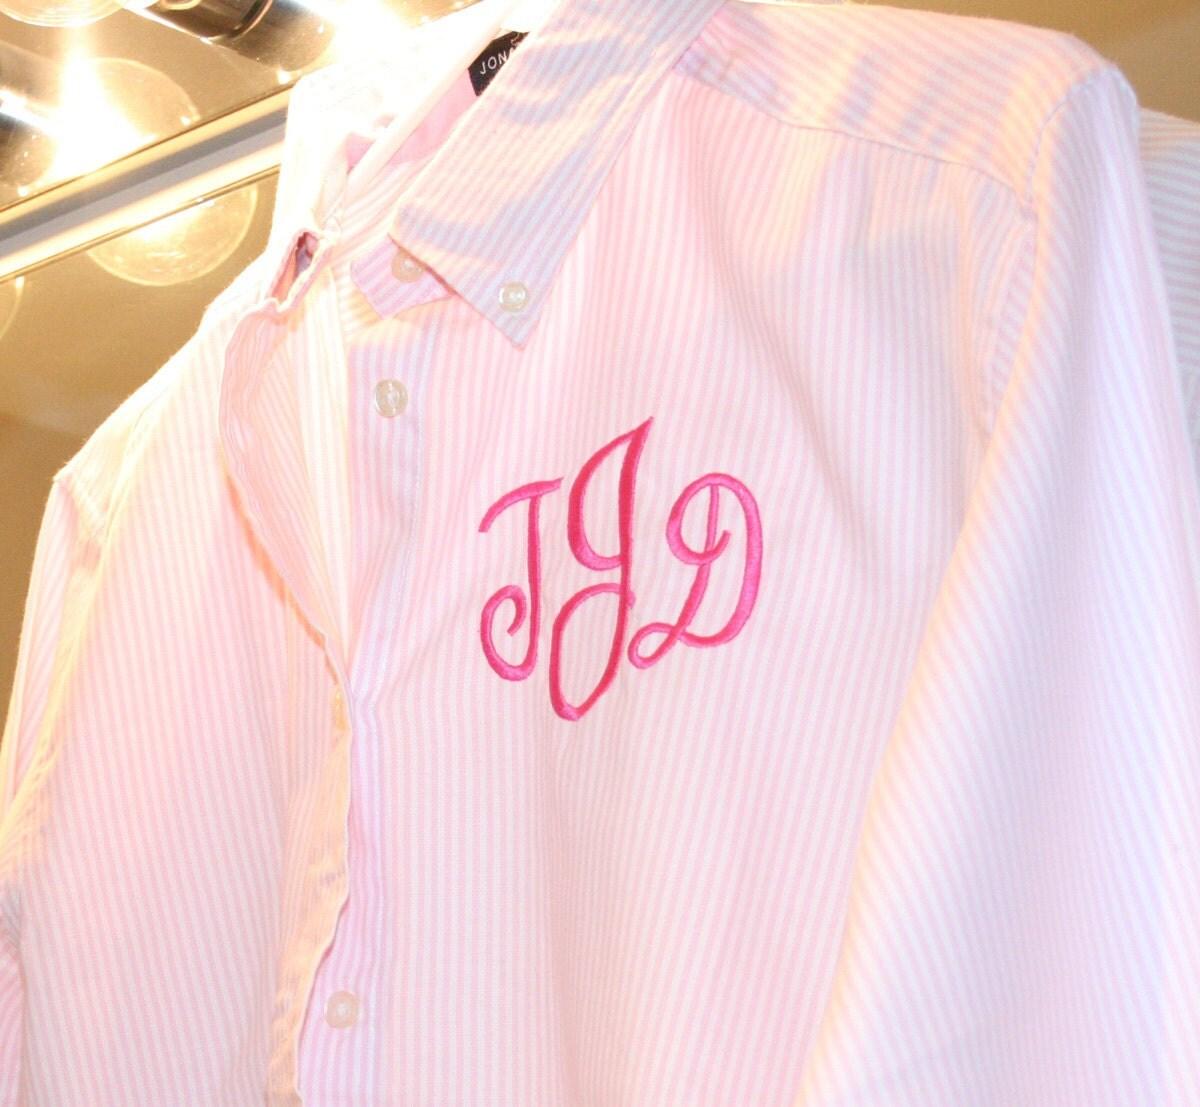 oversized mens shirt monogram pink stripe oxford by shopmemento